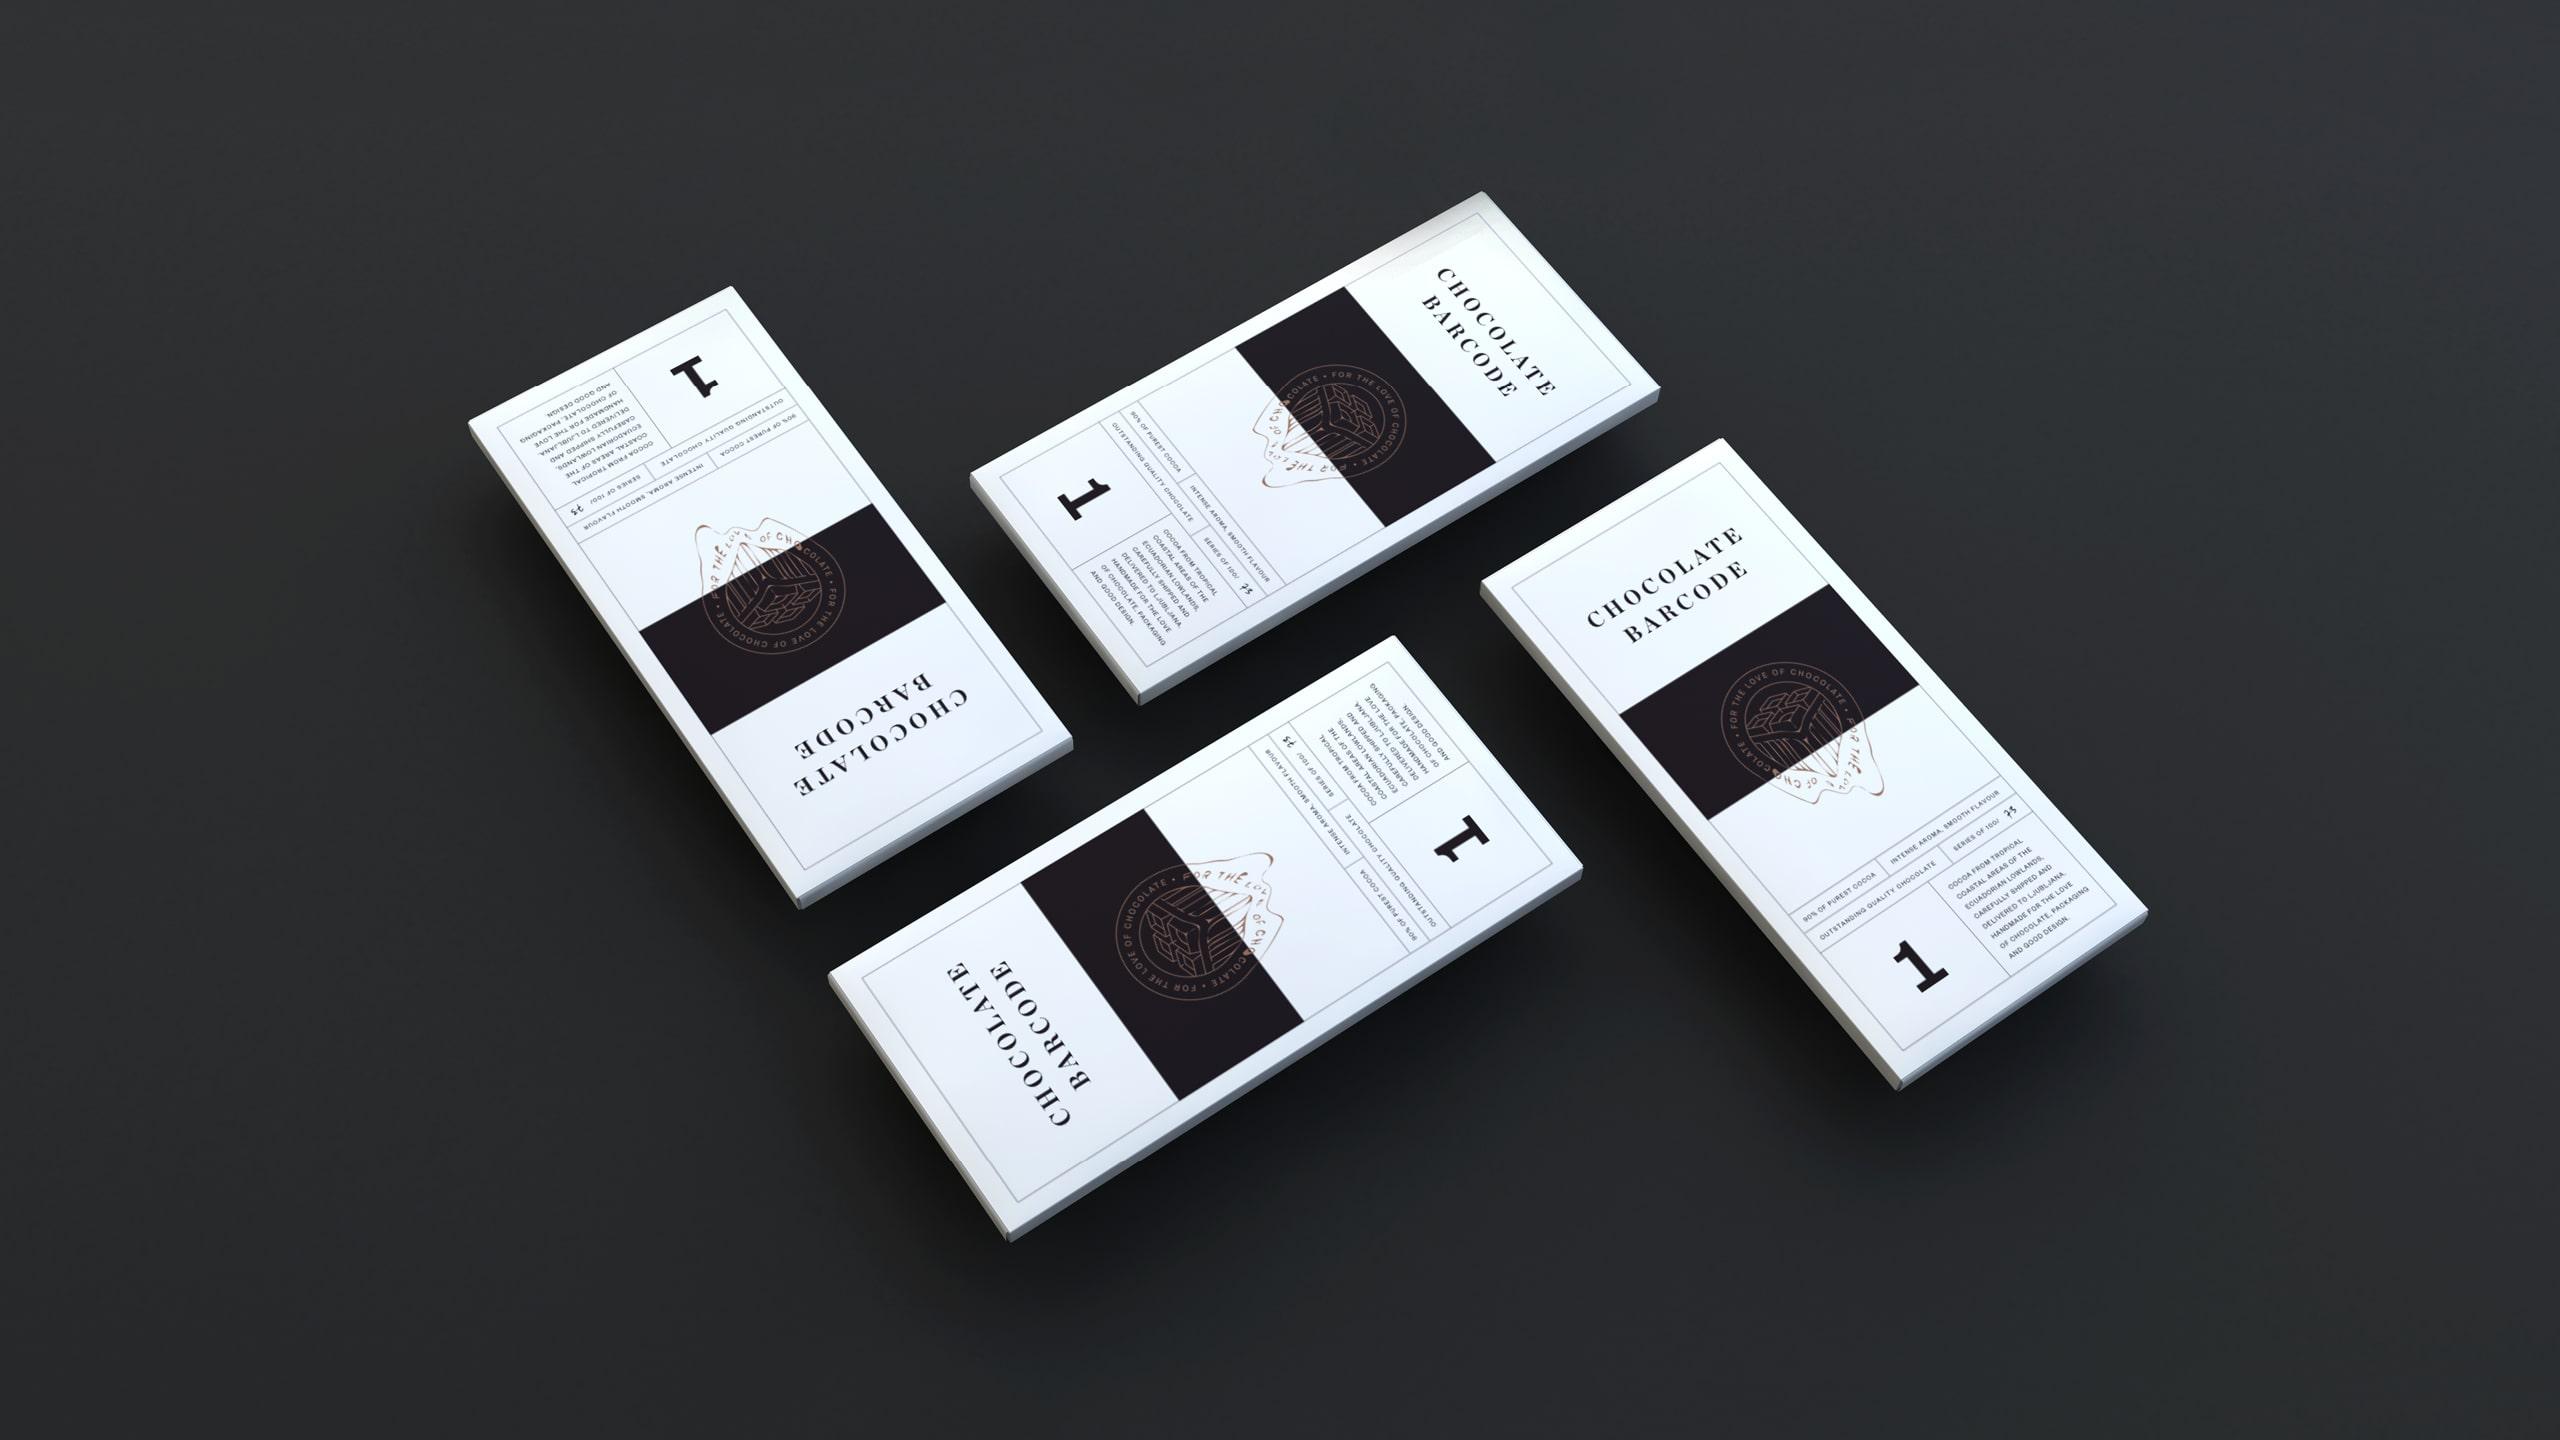 mantik-digital-branding-development-agency-chocolate-packaging-webdesign-design-11-min